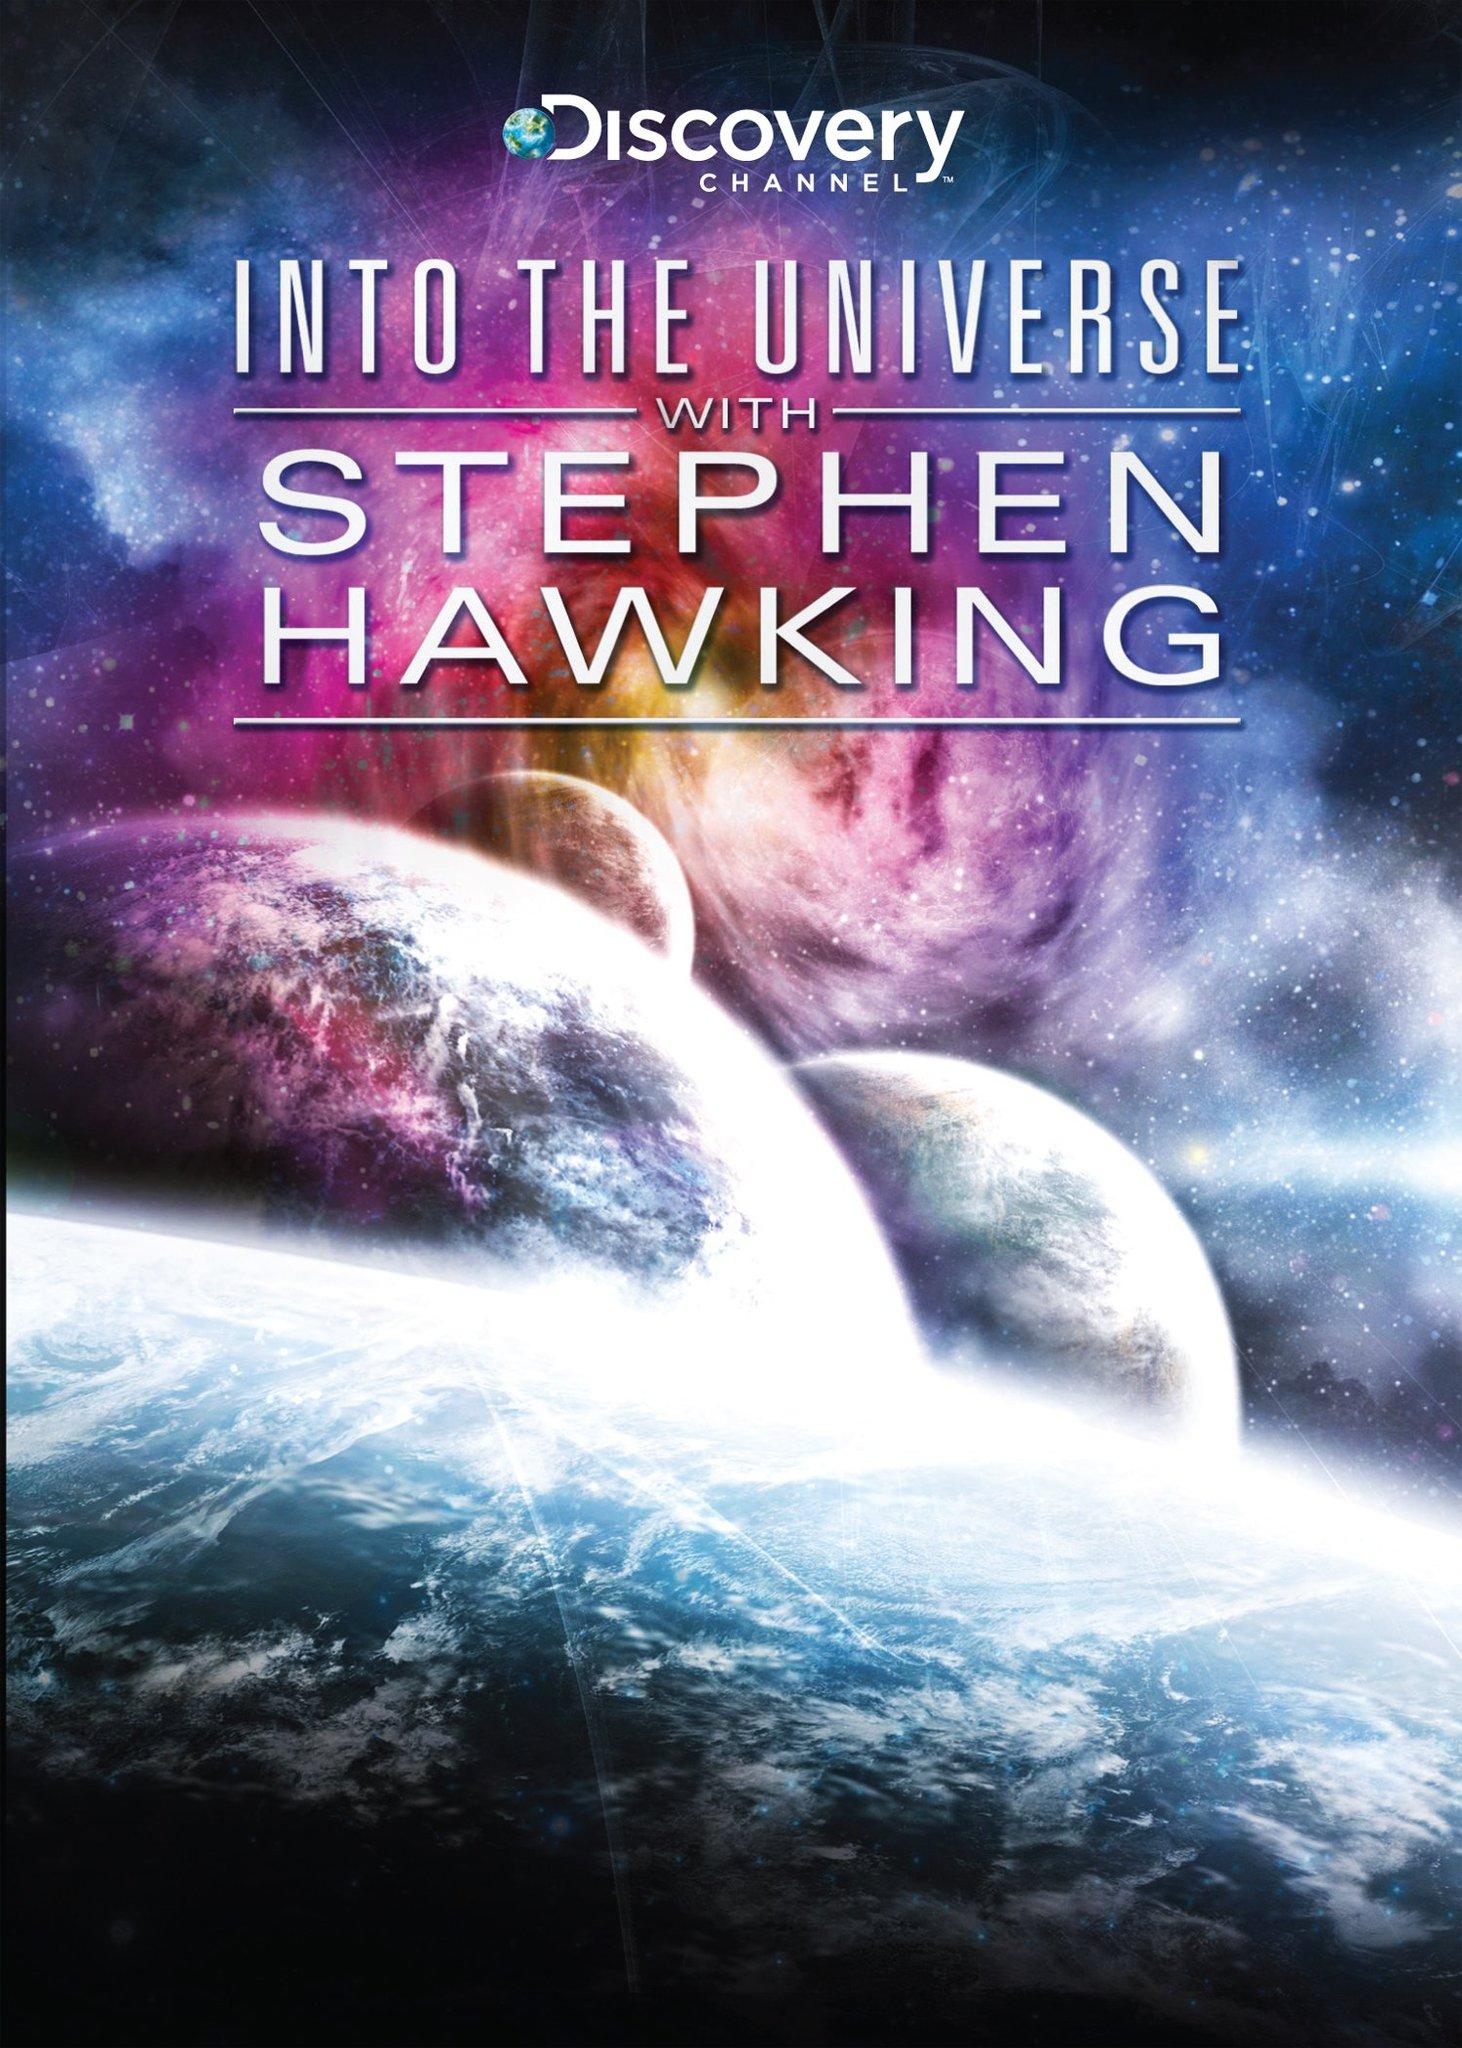 STEPHENO HAWKINGO VISATA (1 Sezonas) / STEPHEN HAWKING'S UNIVERSE Season 1